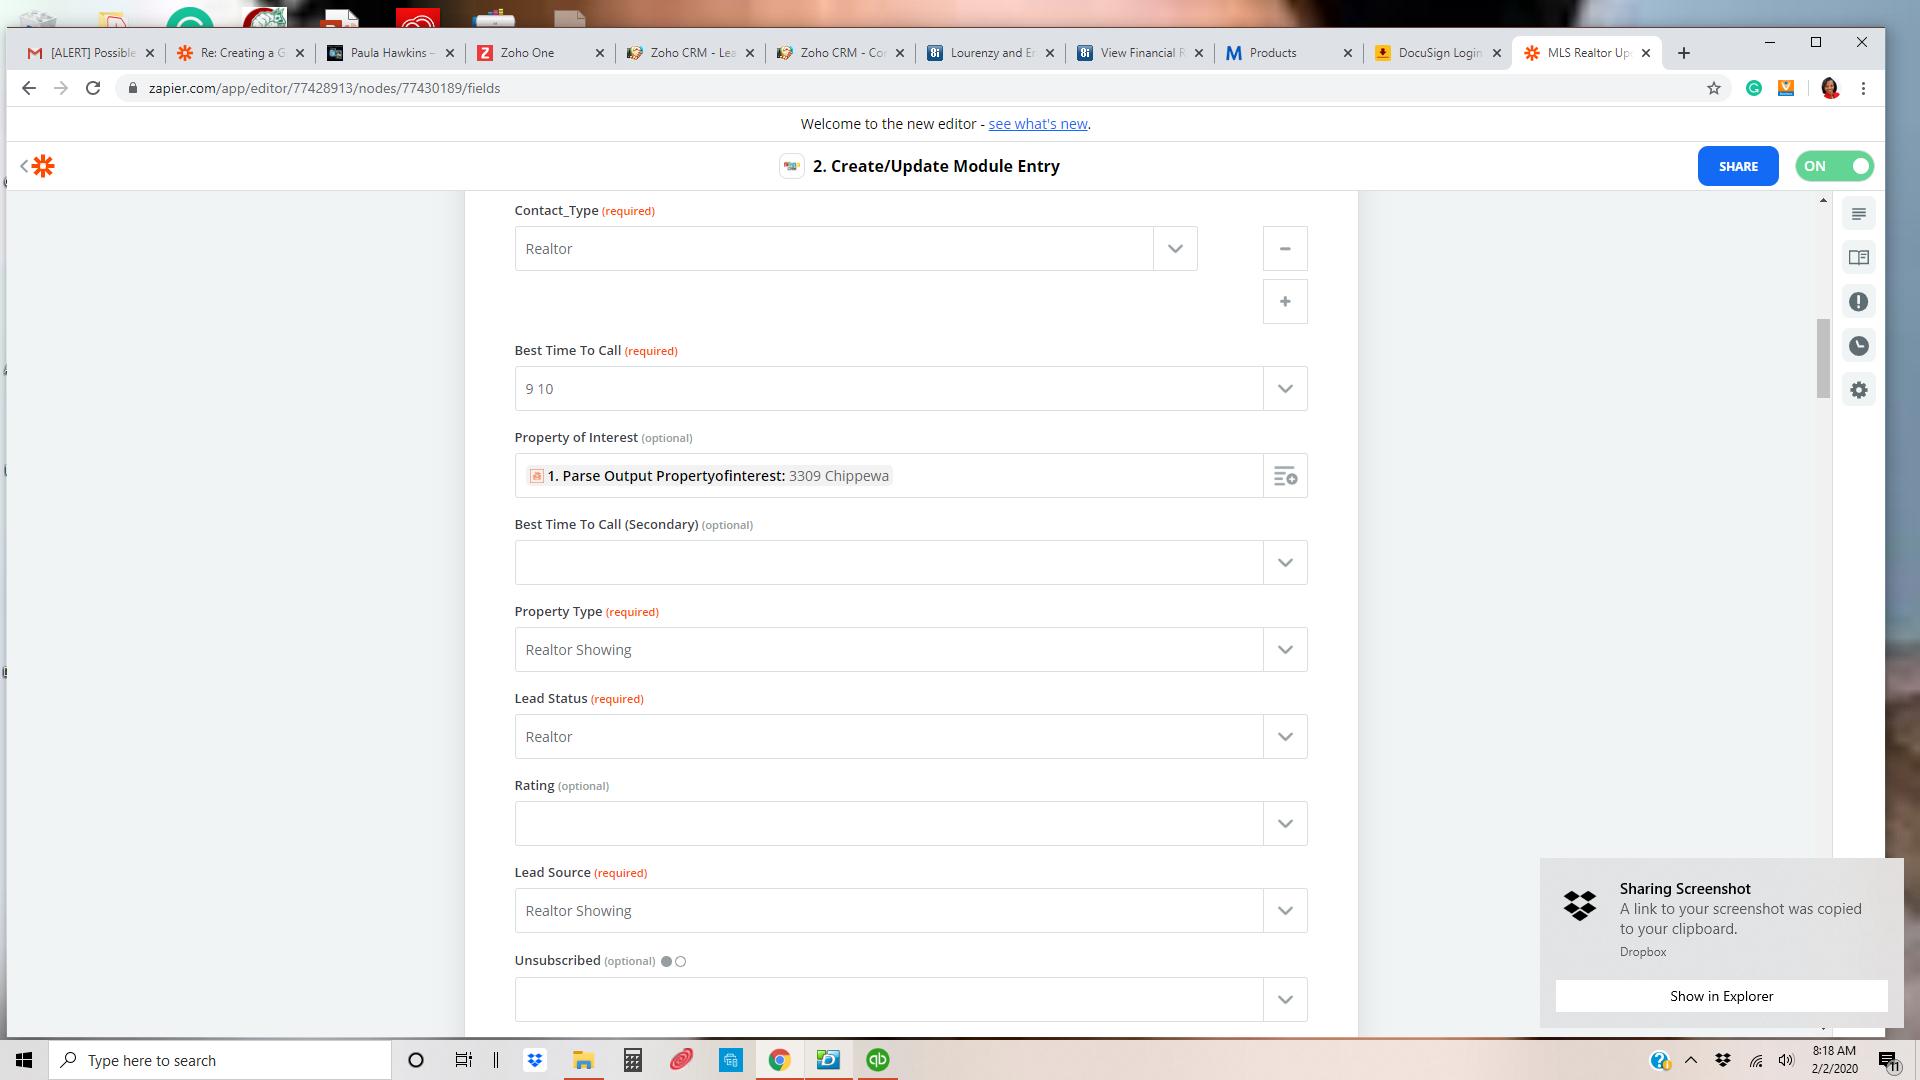 Screenshot 2020-02-02 08.18.07.png